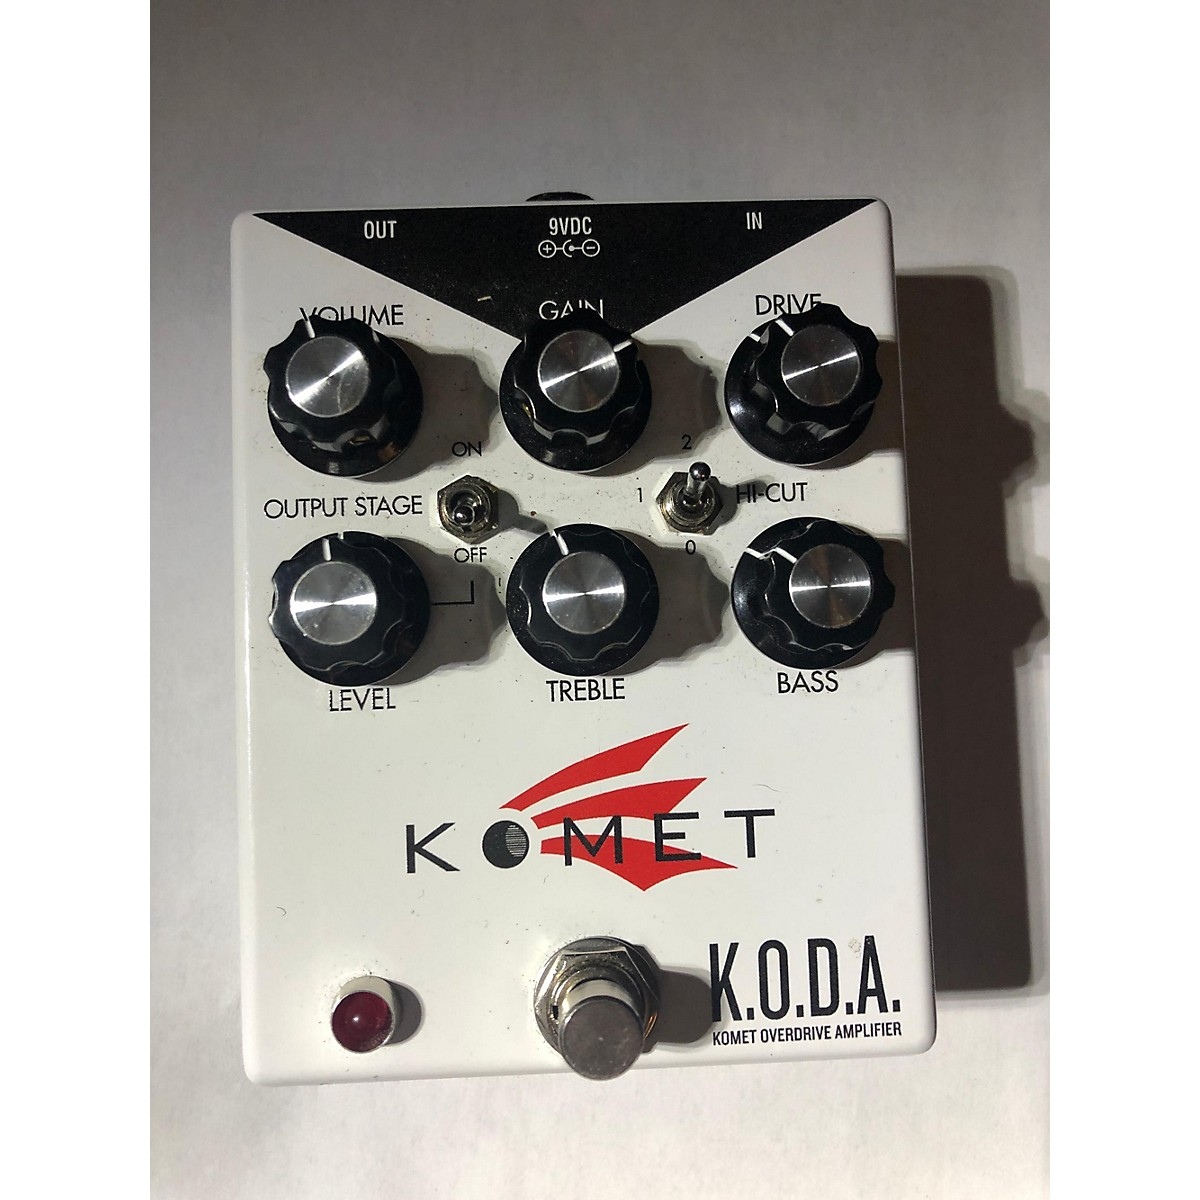 Keeley KOMET K.O.D.A OVERDRIVE Effect Pedal